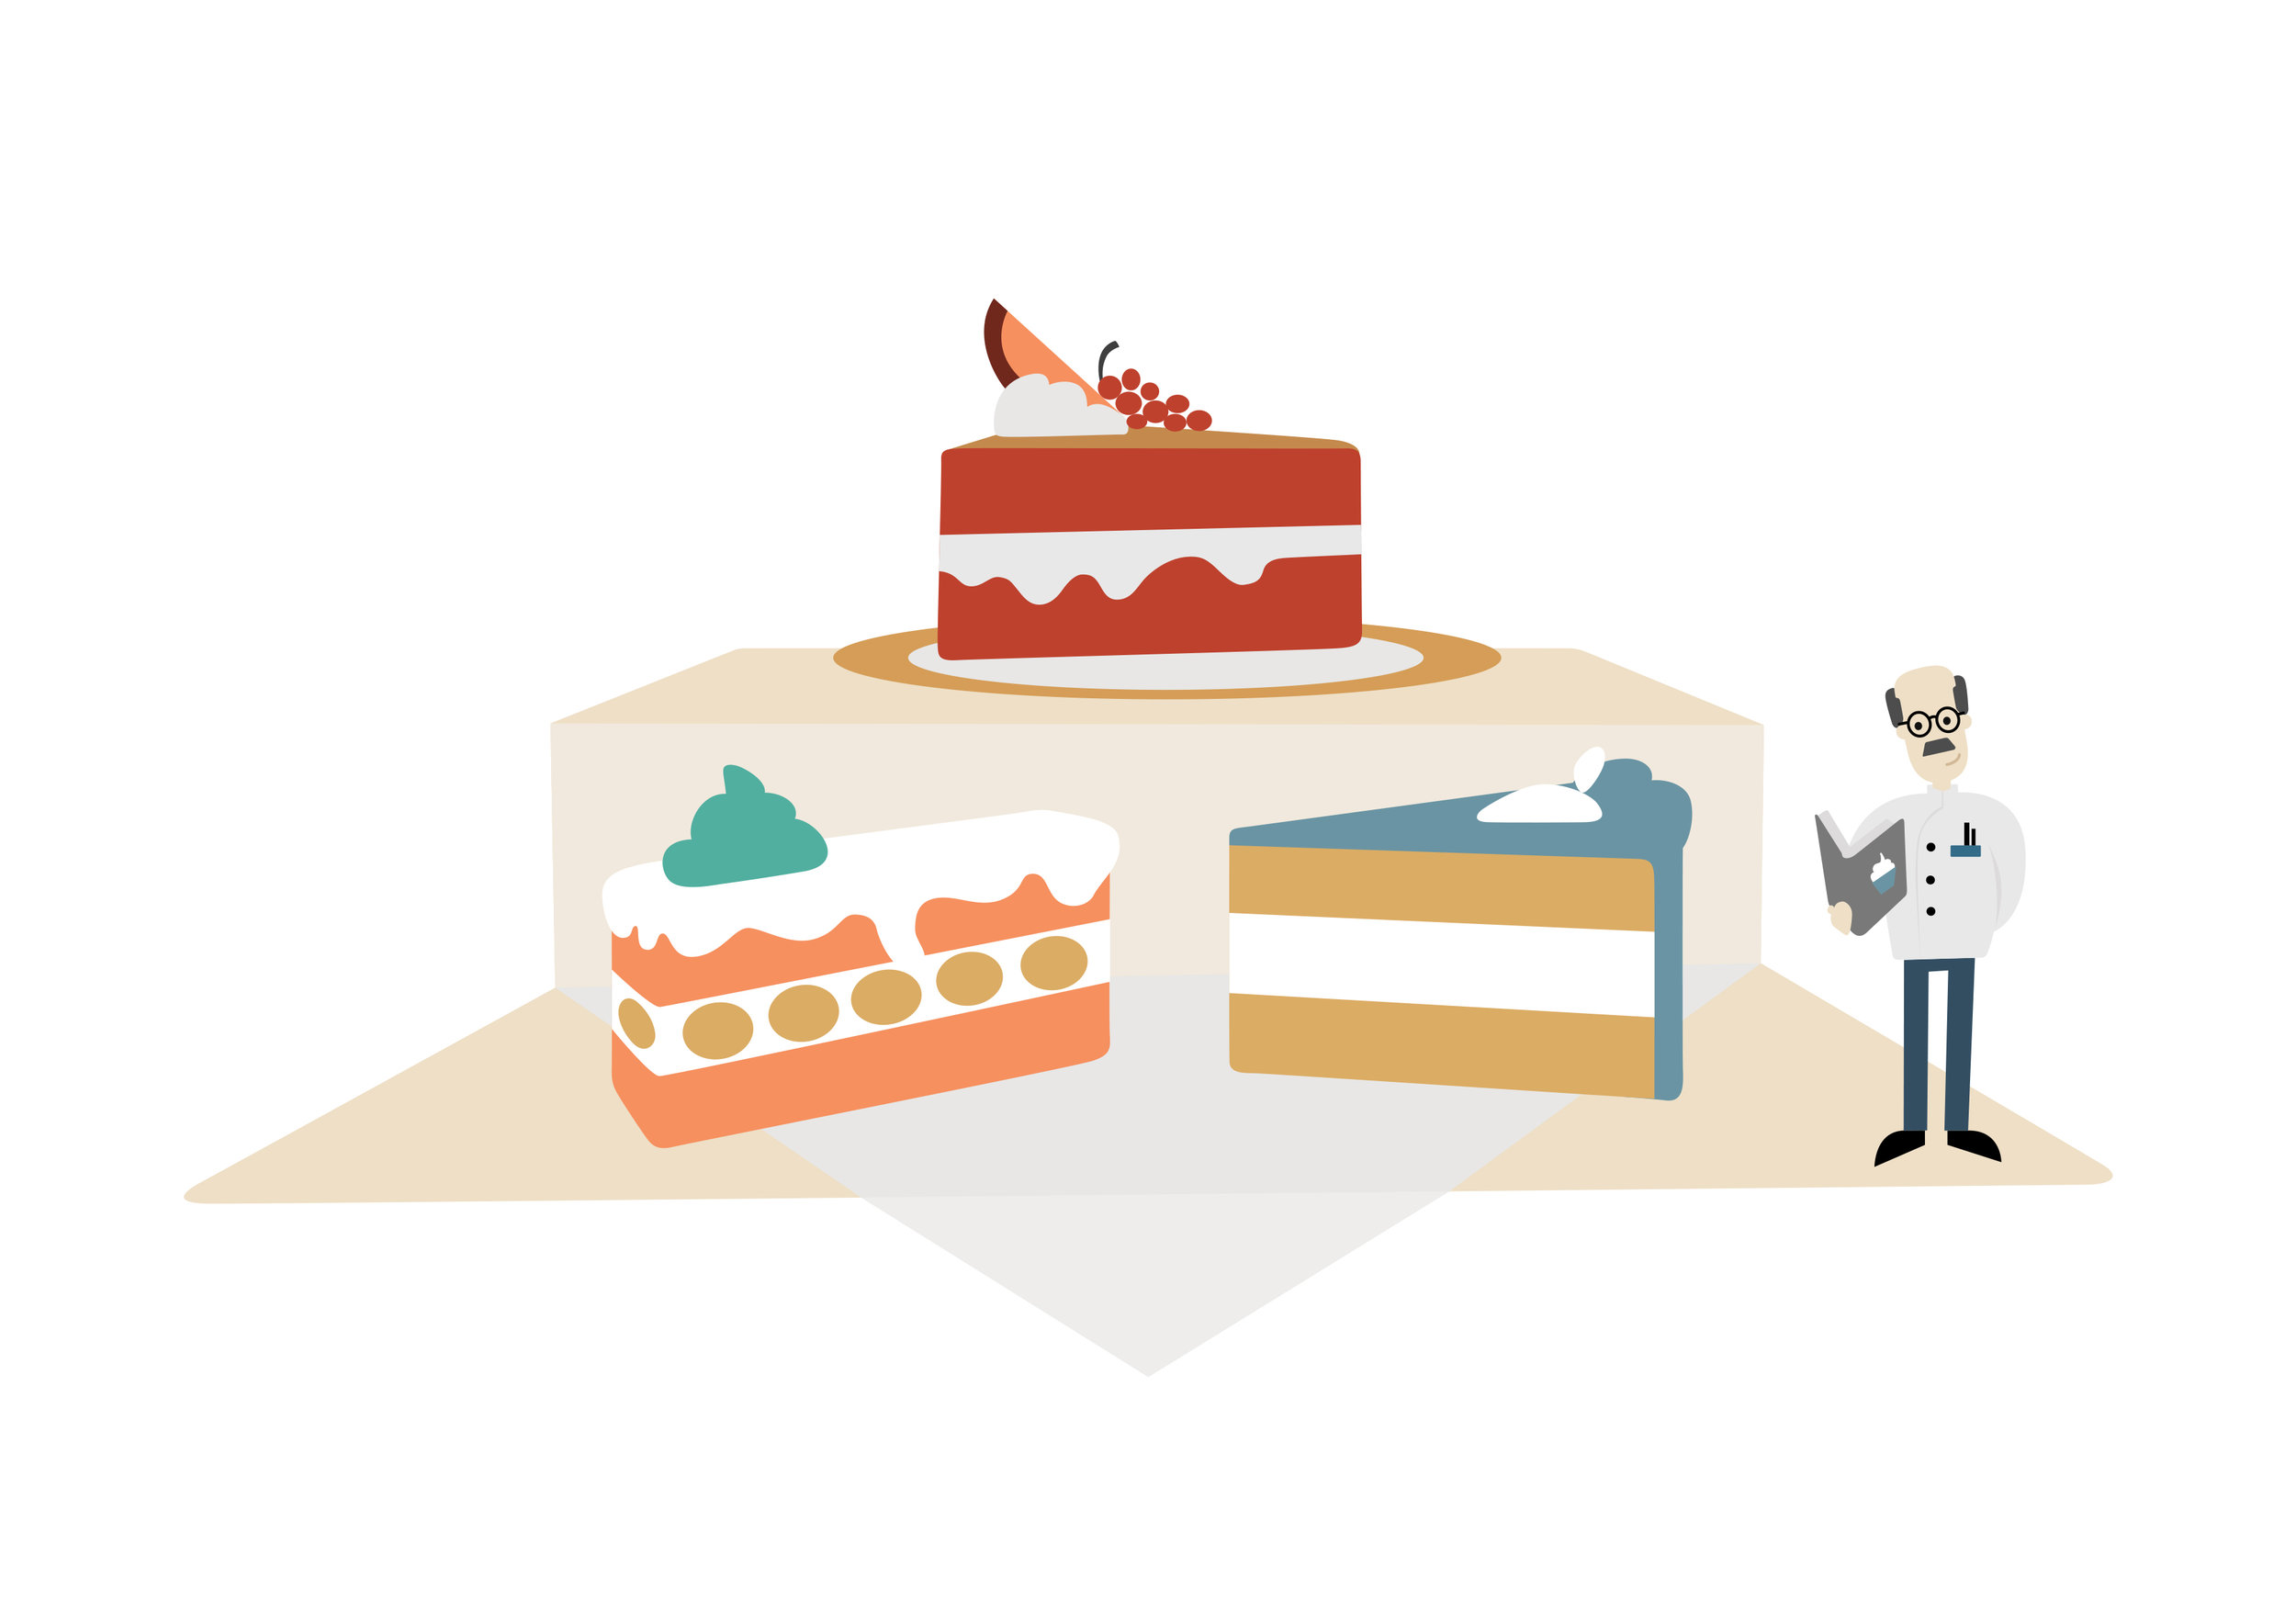 LHBS_Agile_Sprint_Guide_Illustration_09.jpg